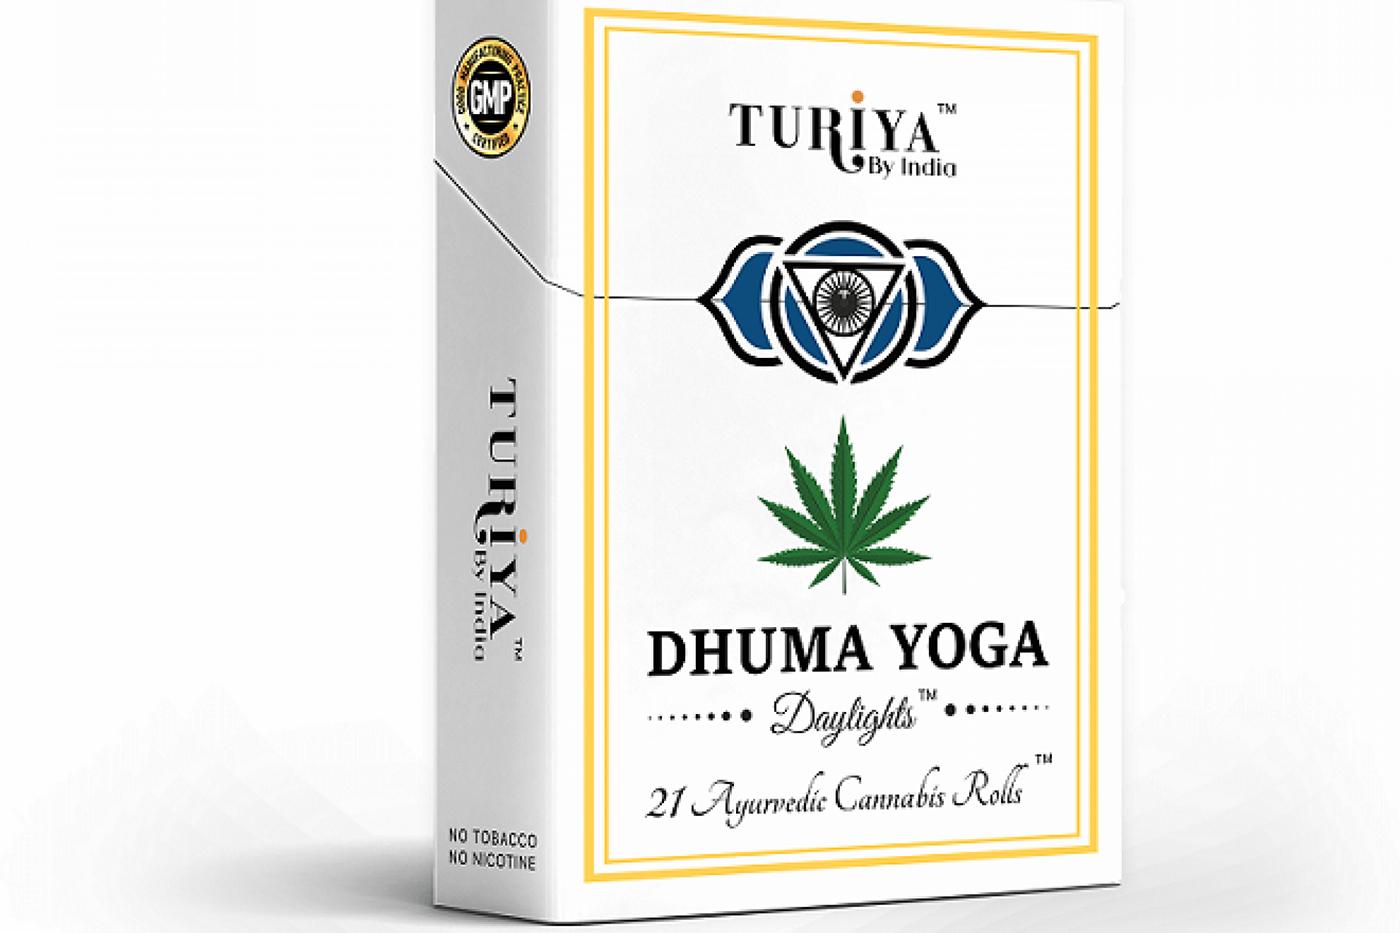 Turiya Introduces Dhuma Yoga in India